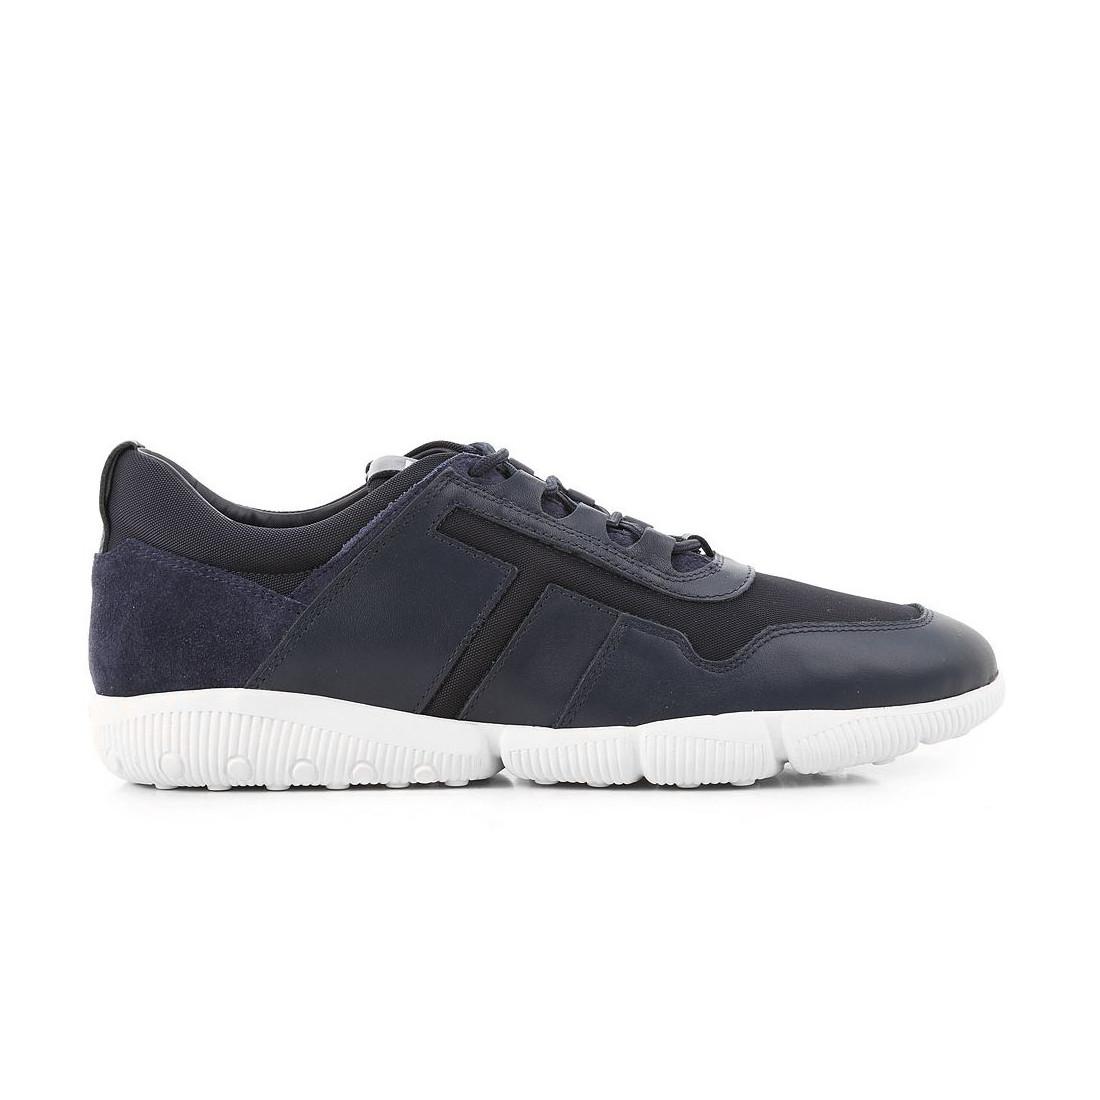 sneakers uomo tods xxm25c0cp50nxmhg89 6644